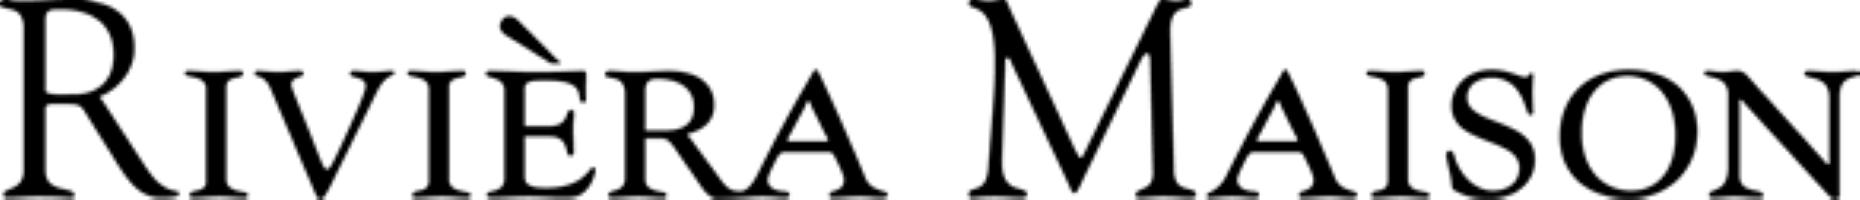 logo Riviera Maison kant van Bureau Goed Gevonden